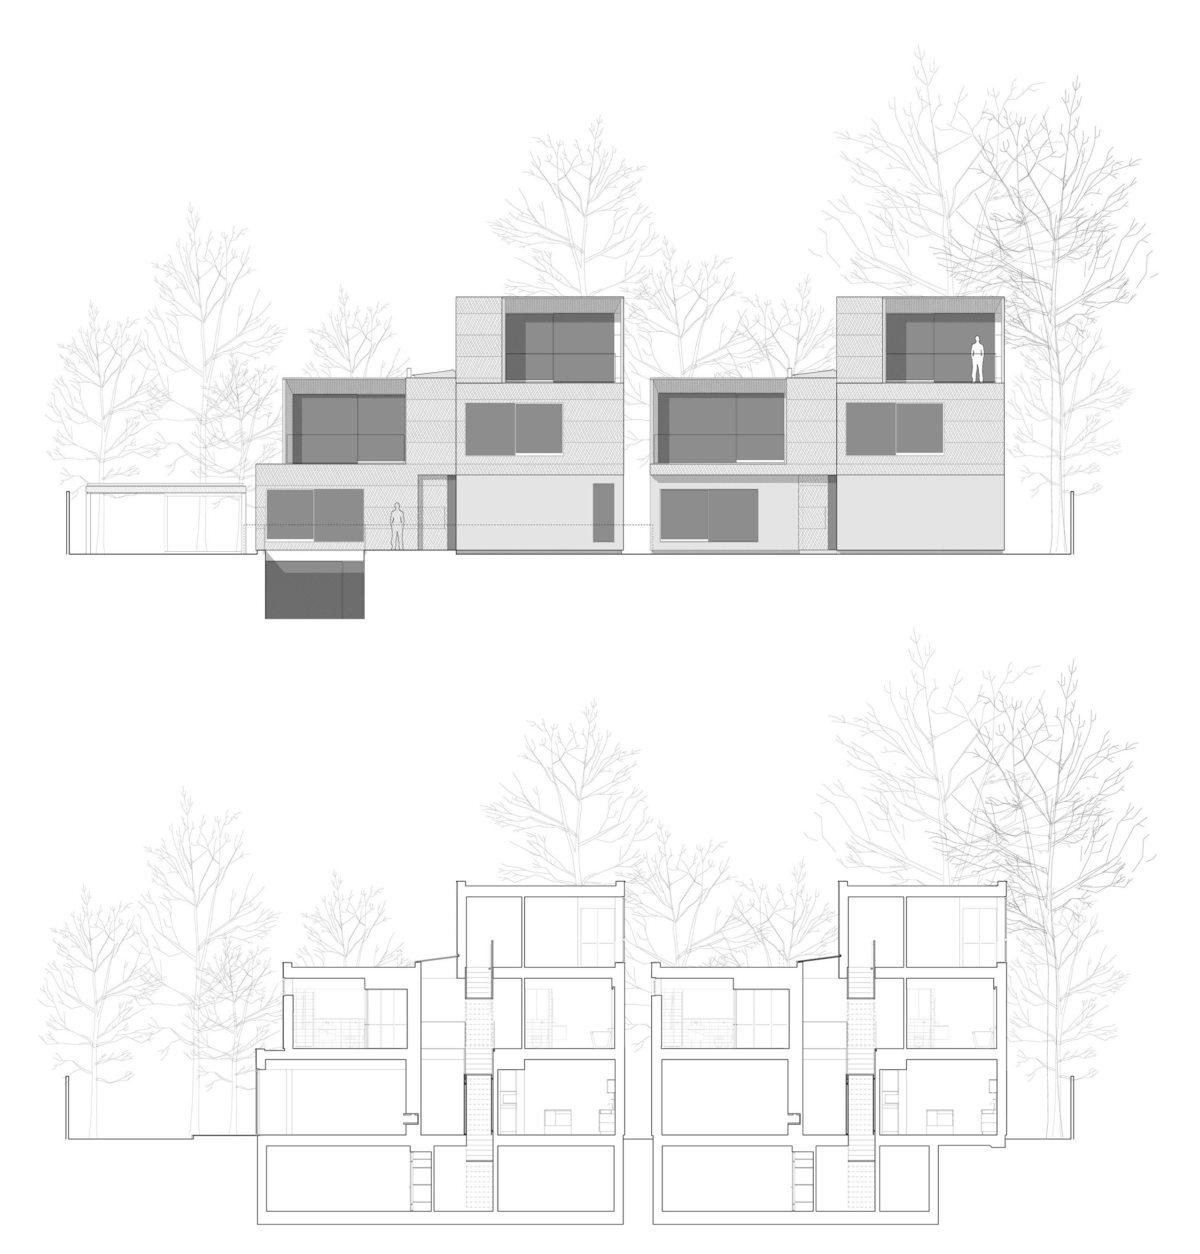 Alison Brooks Architects _ Herringbone Houses _ Sections Elevations 1